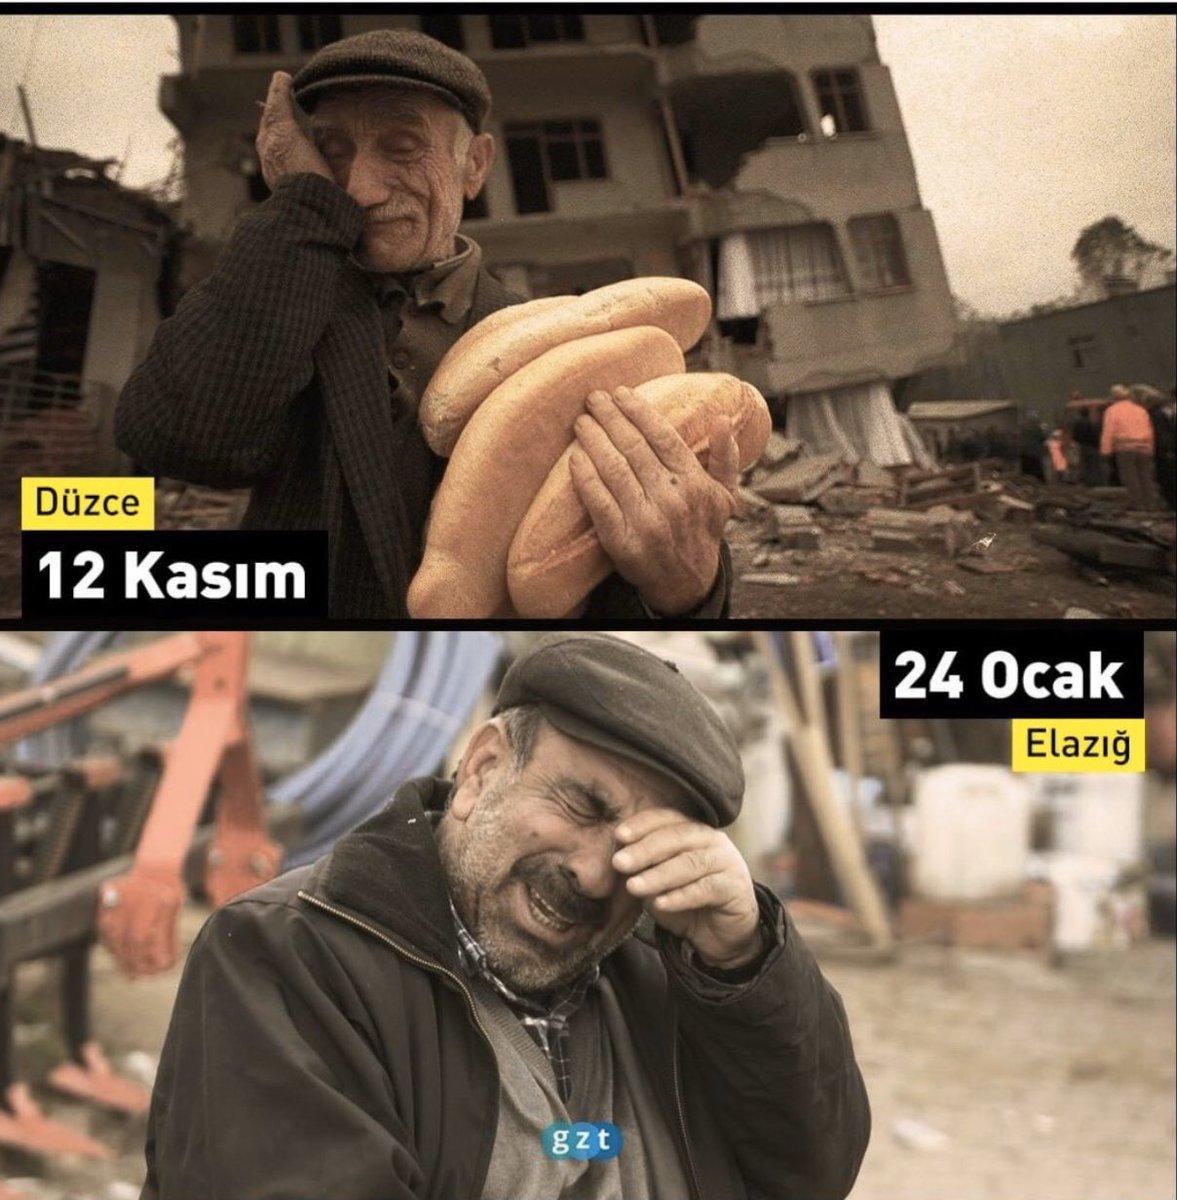 #Elazig